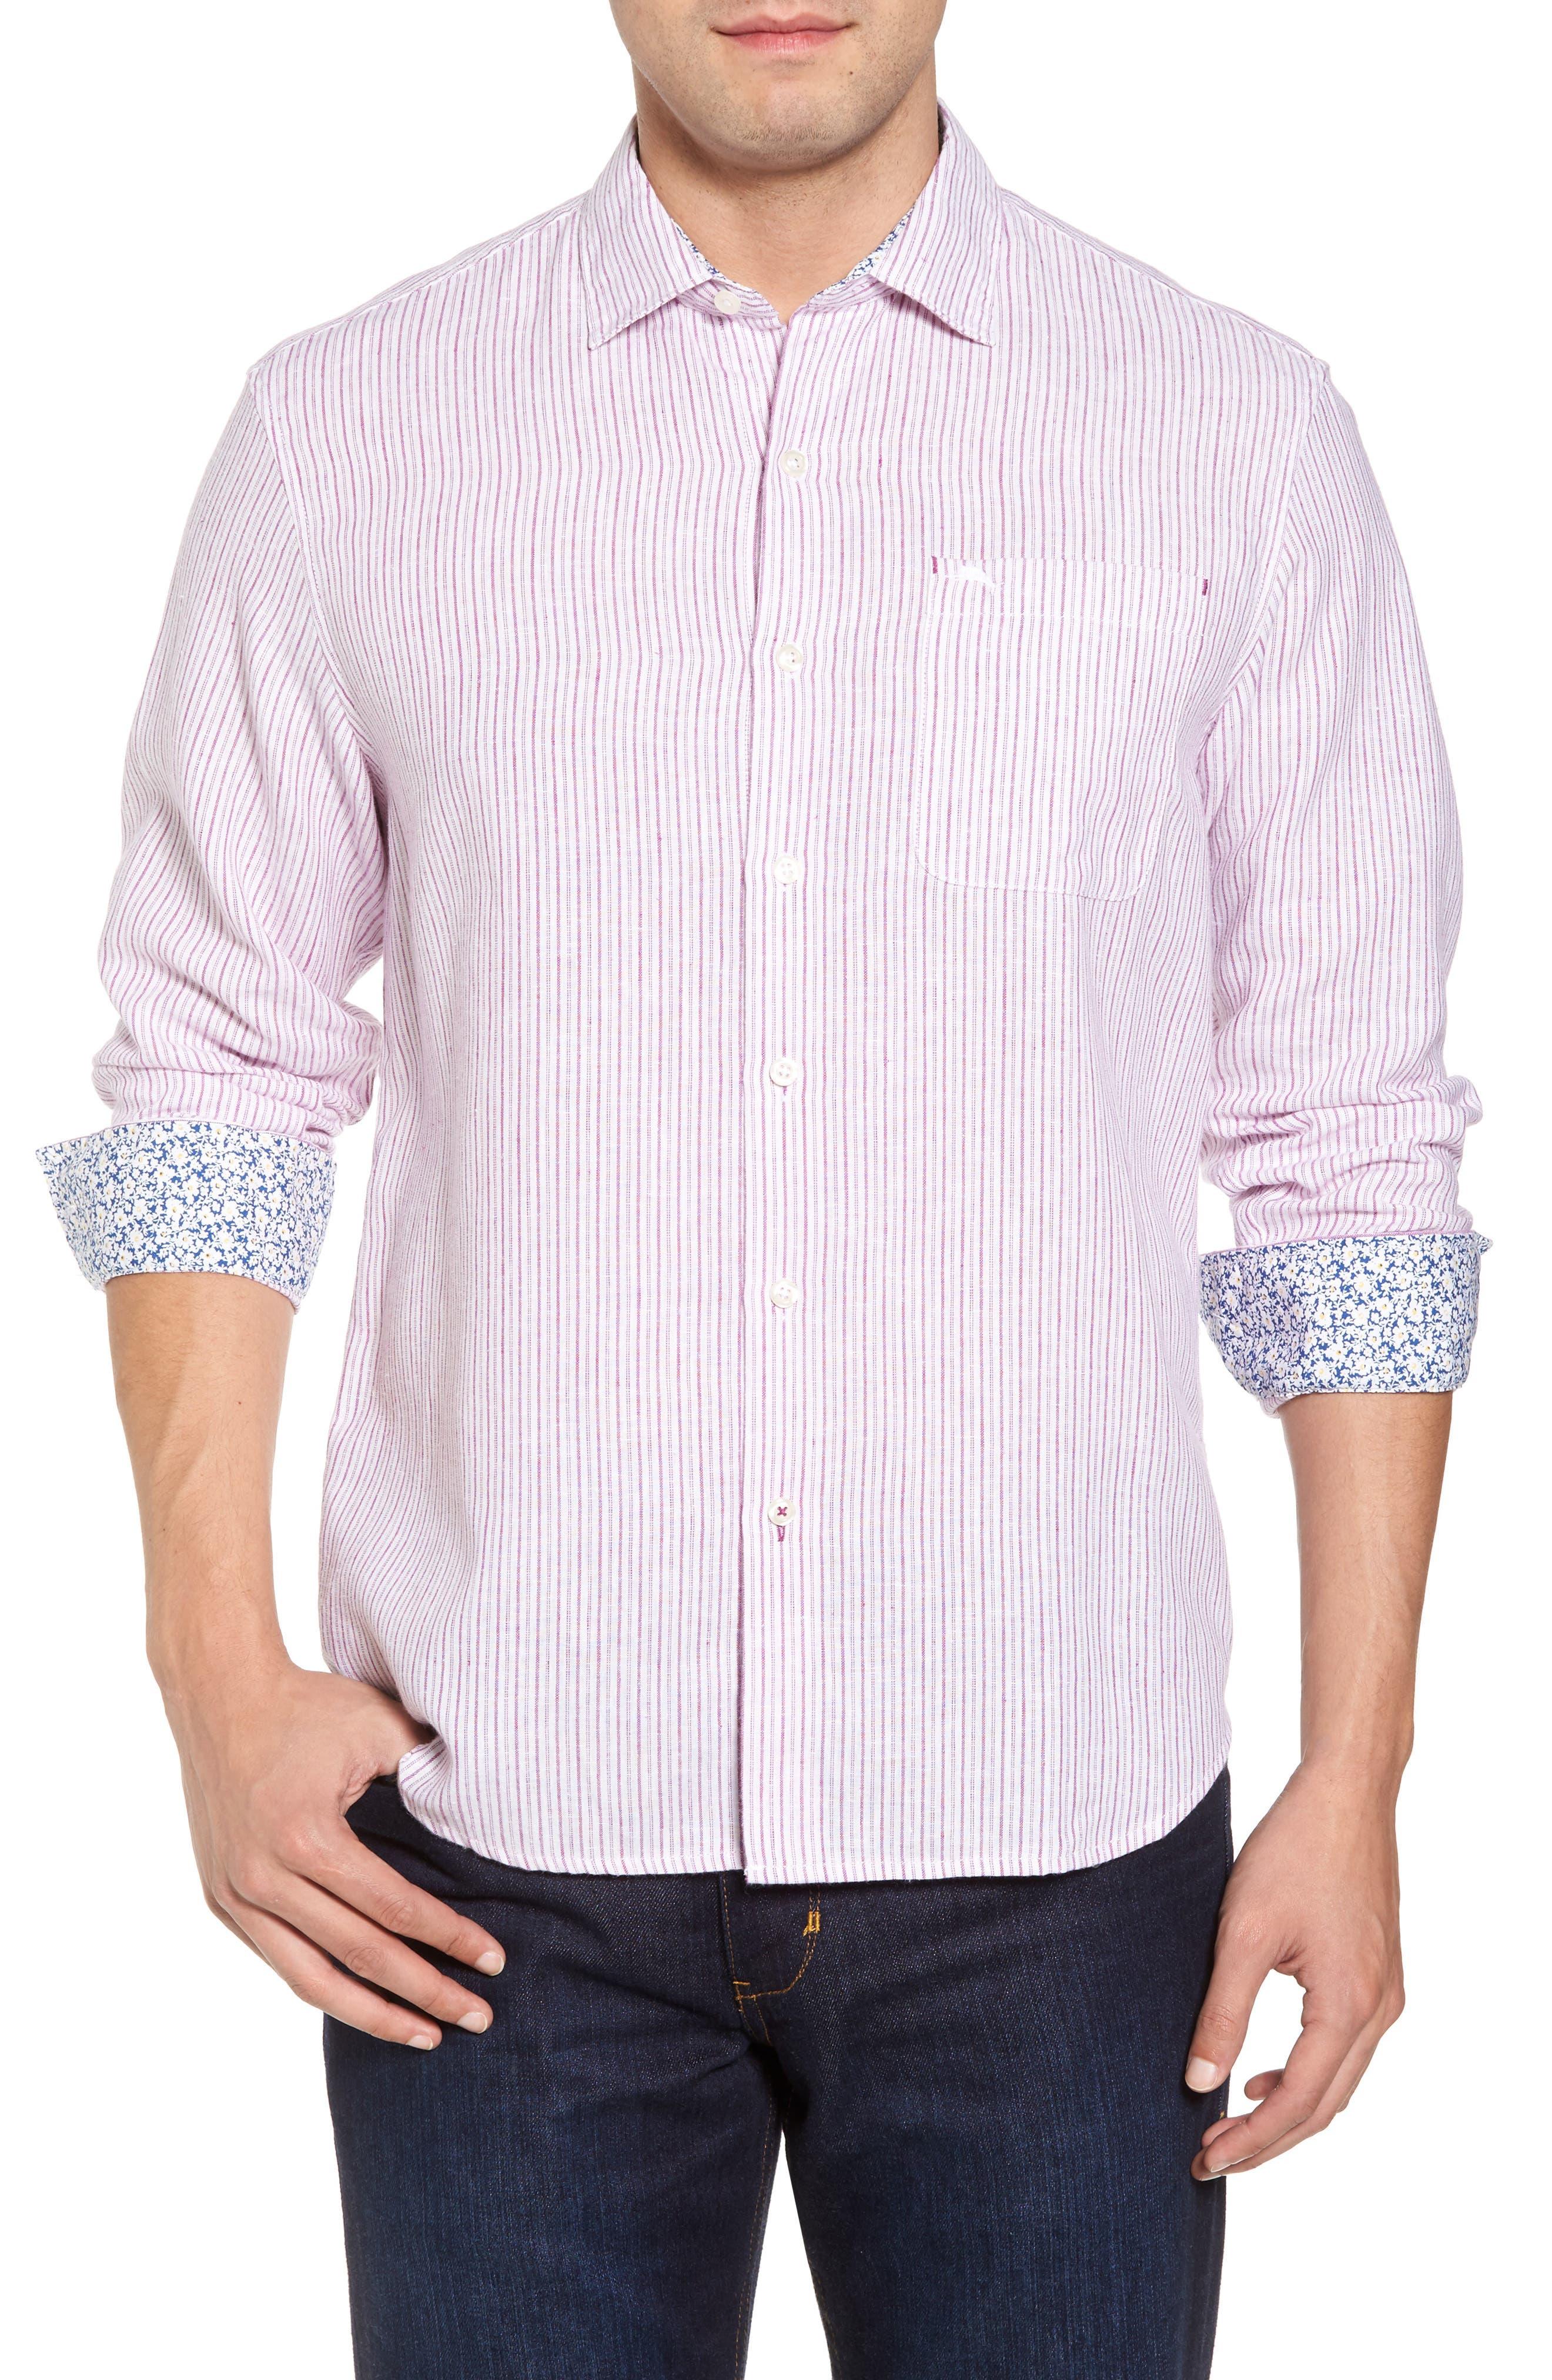 Bungalow Stripe Regular Fit Linen Blend Sport Shirt,                         Main,                         color, Ultra Violet